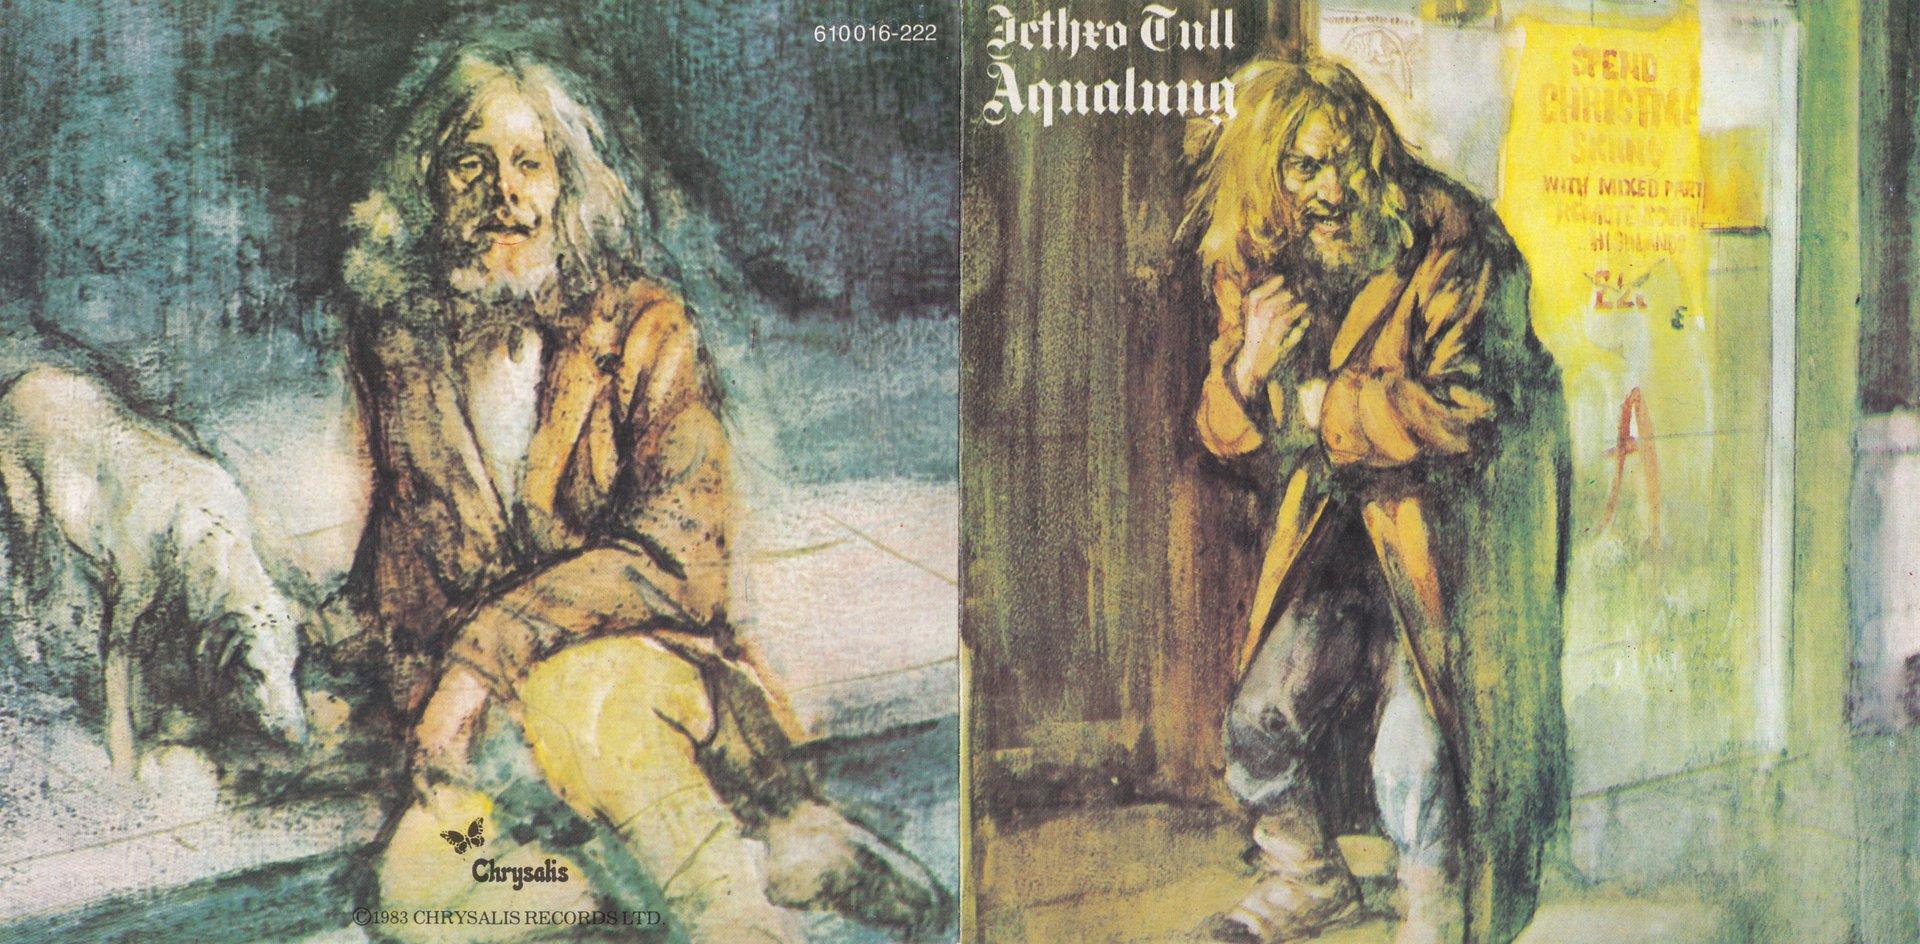 Jethro Tull - Aqualung. Ariola 610016-222. 1983.jpg